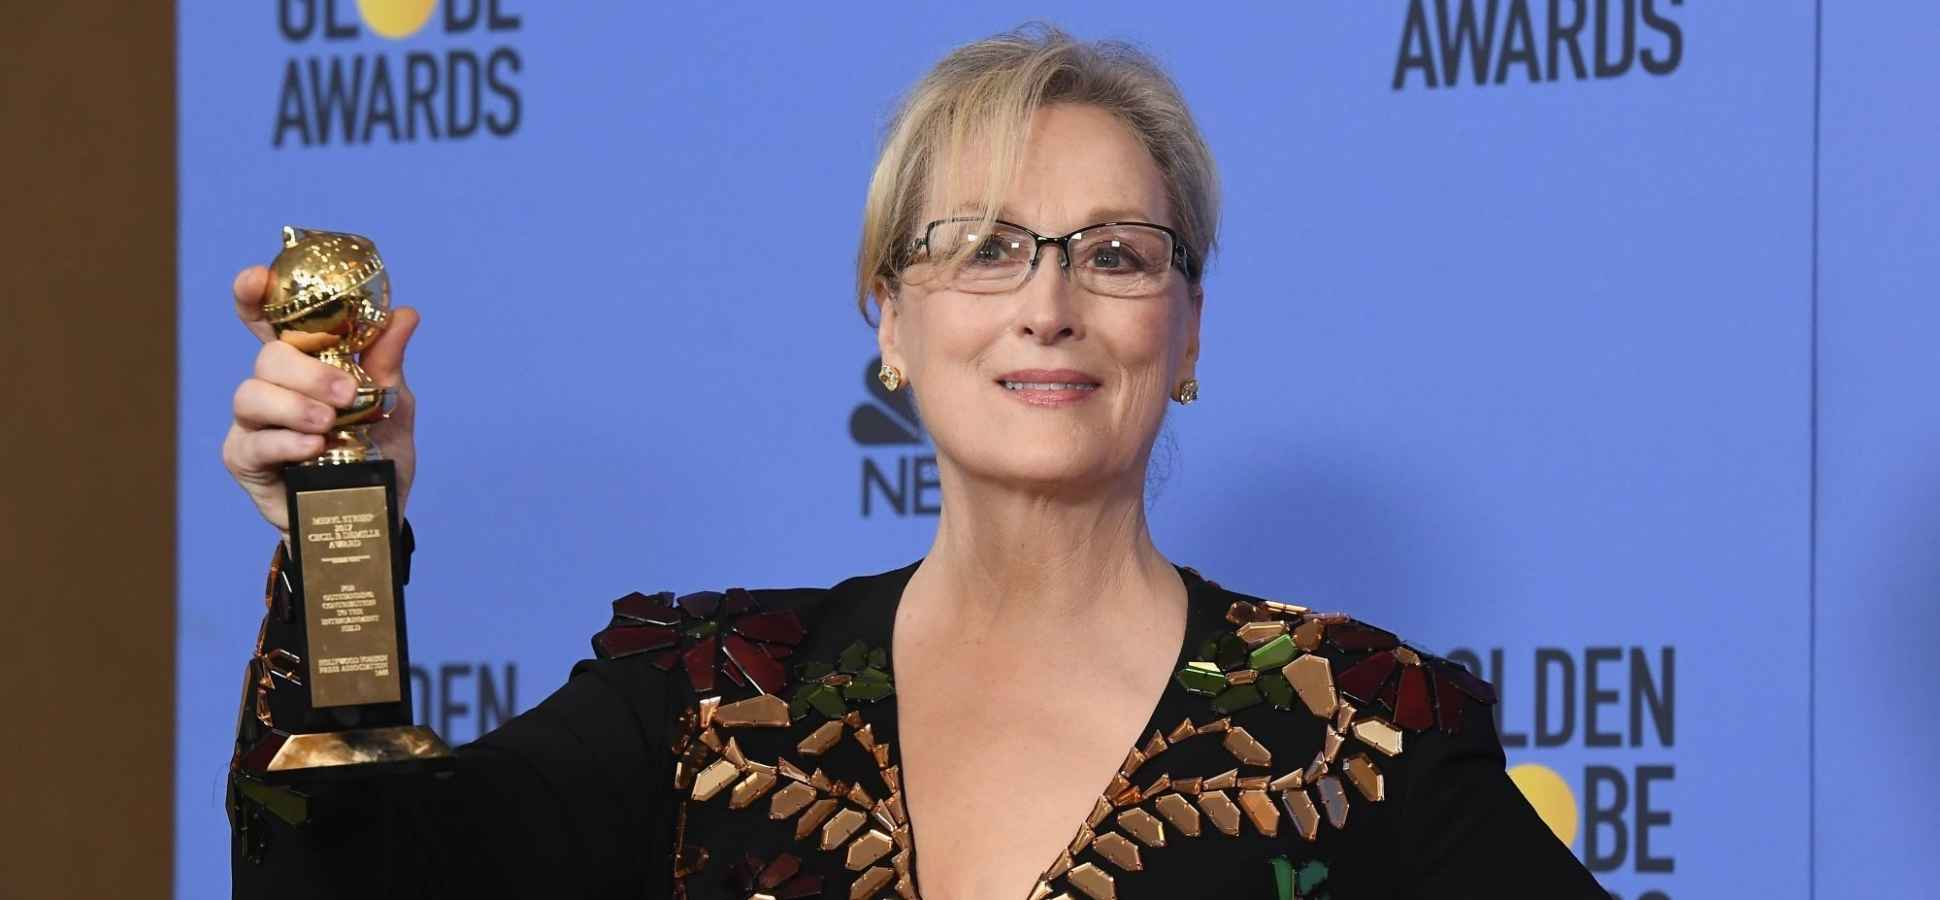 The 3 Takeaways Every Employer Should Get From Meryl Streep's Golden Globe Speech